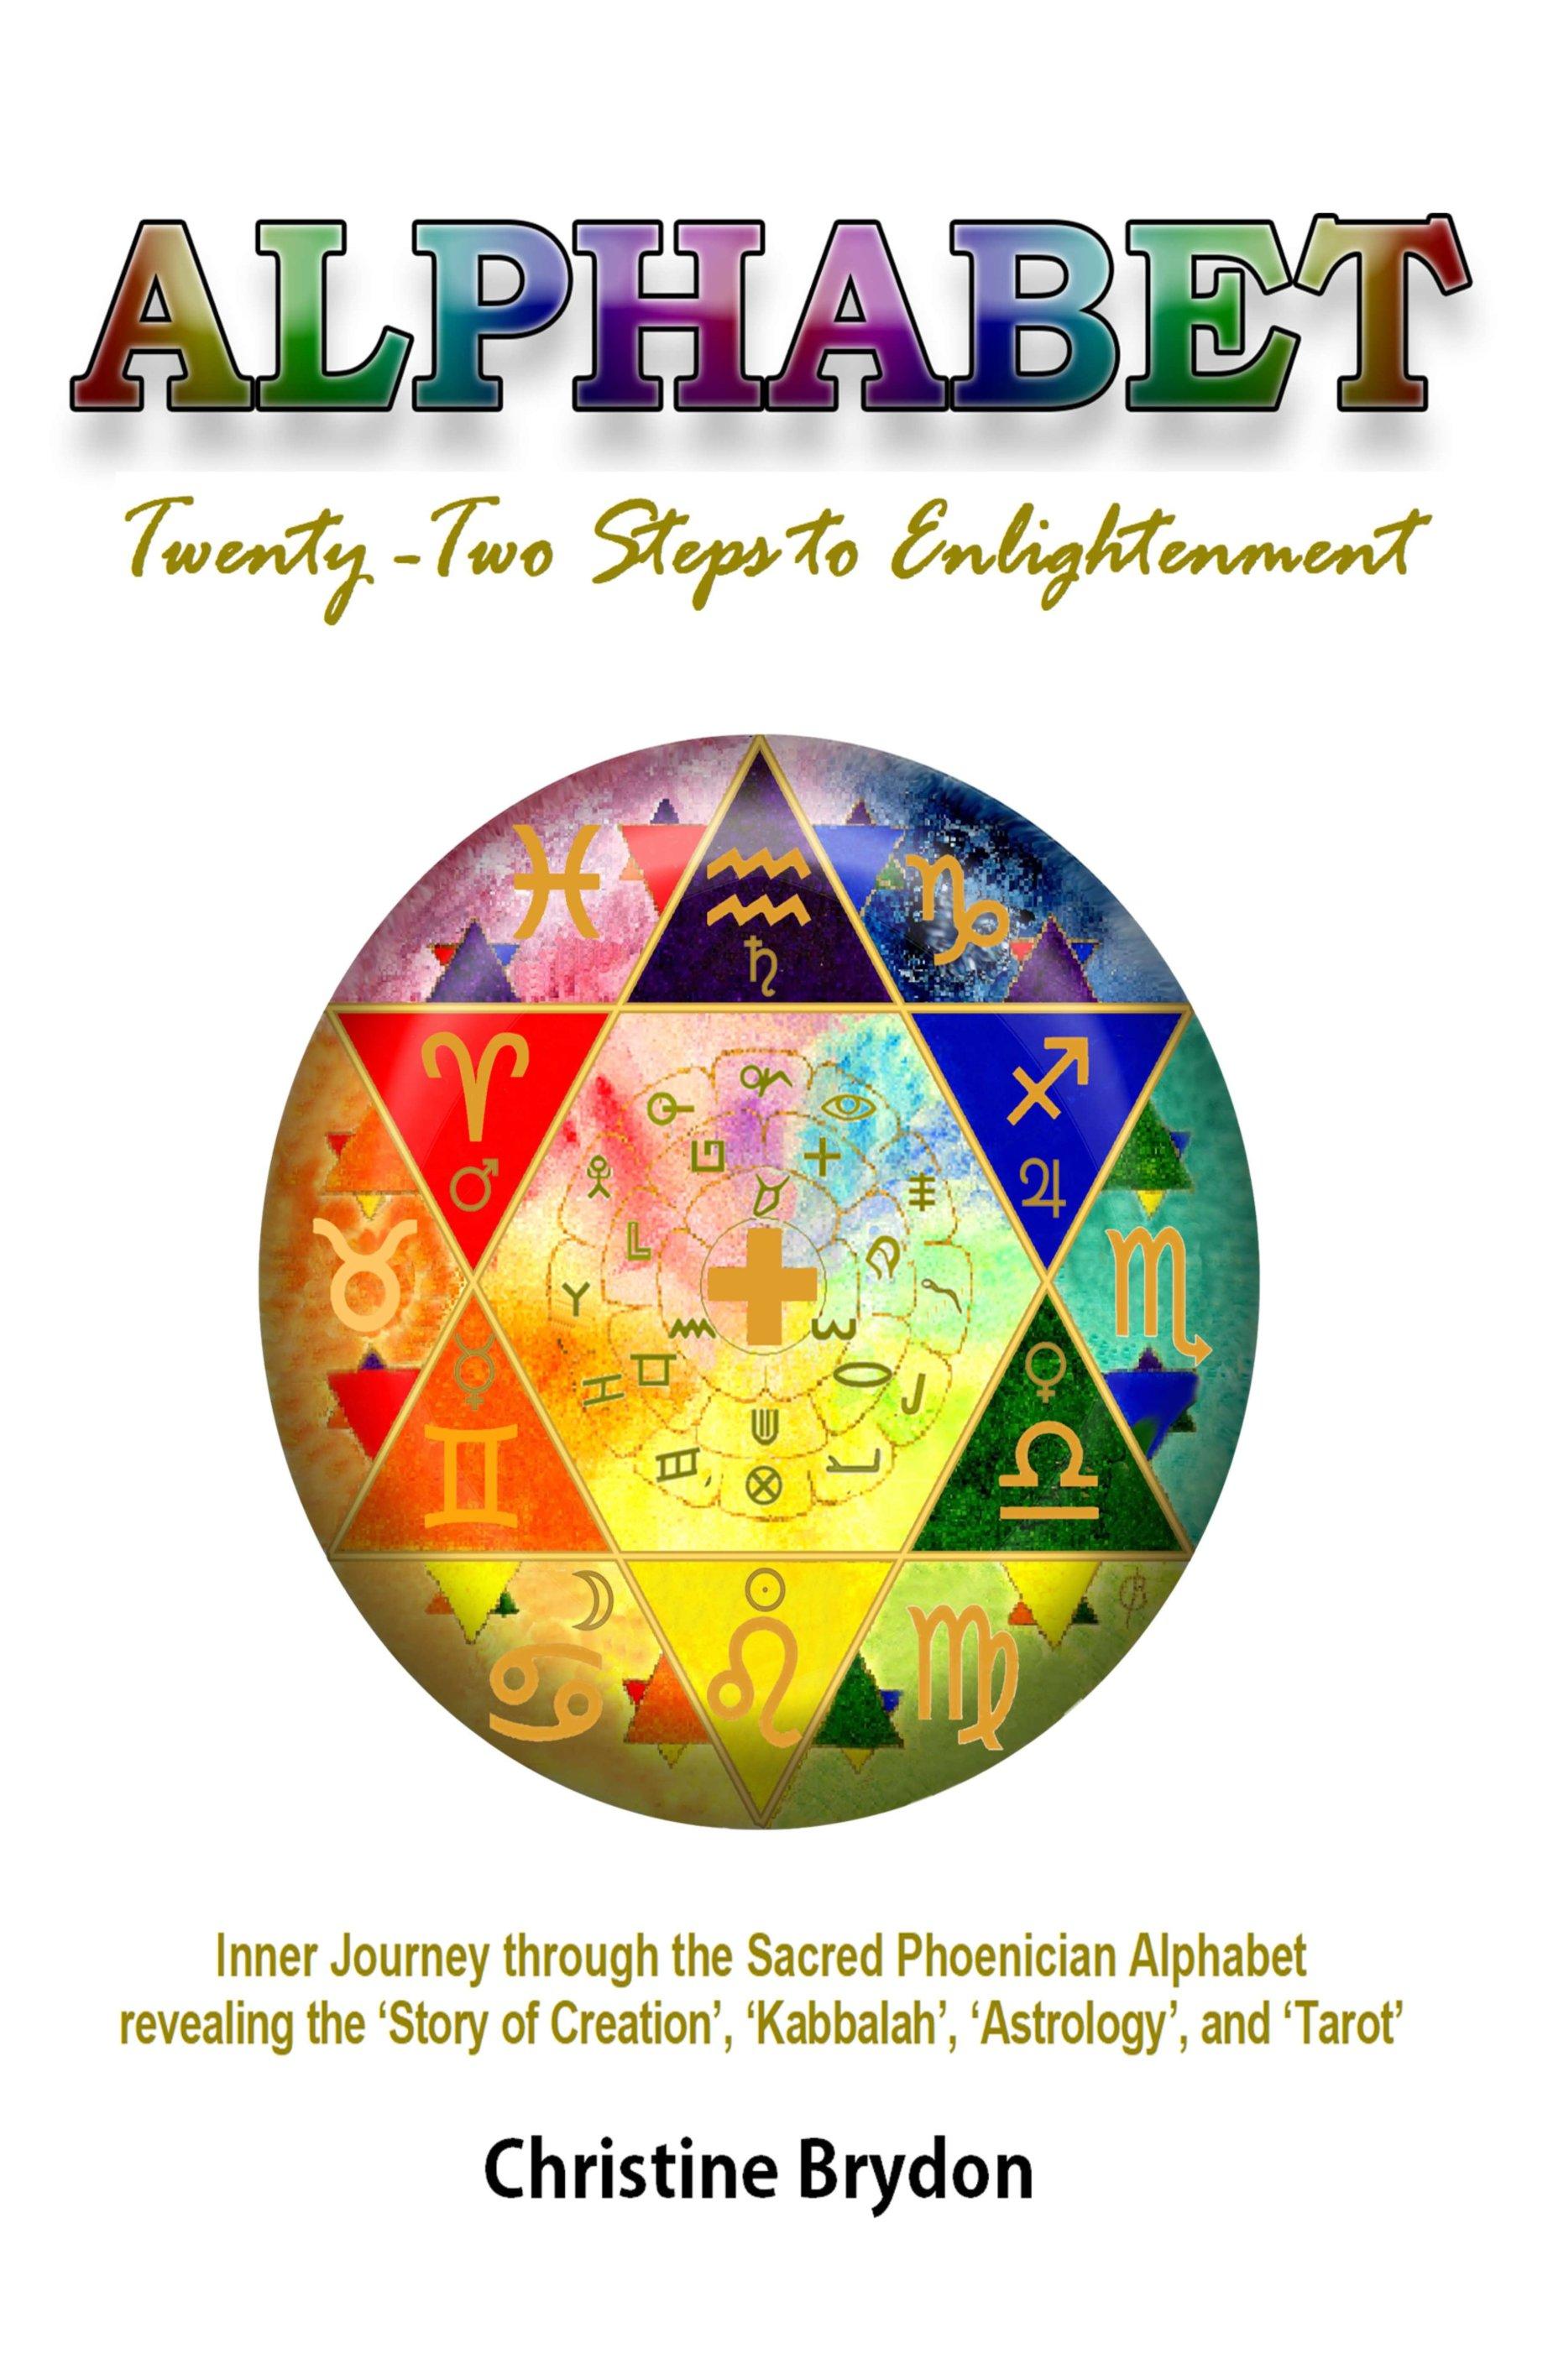 \'Alphabet\' Twenty-Two Steps to Enlightenment - Inner Journey through the Sacred Phoenician Alphabet